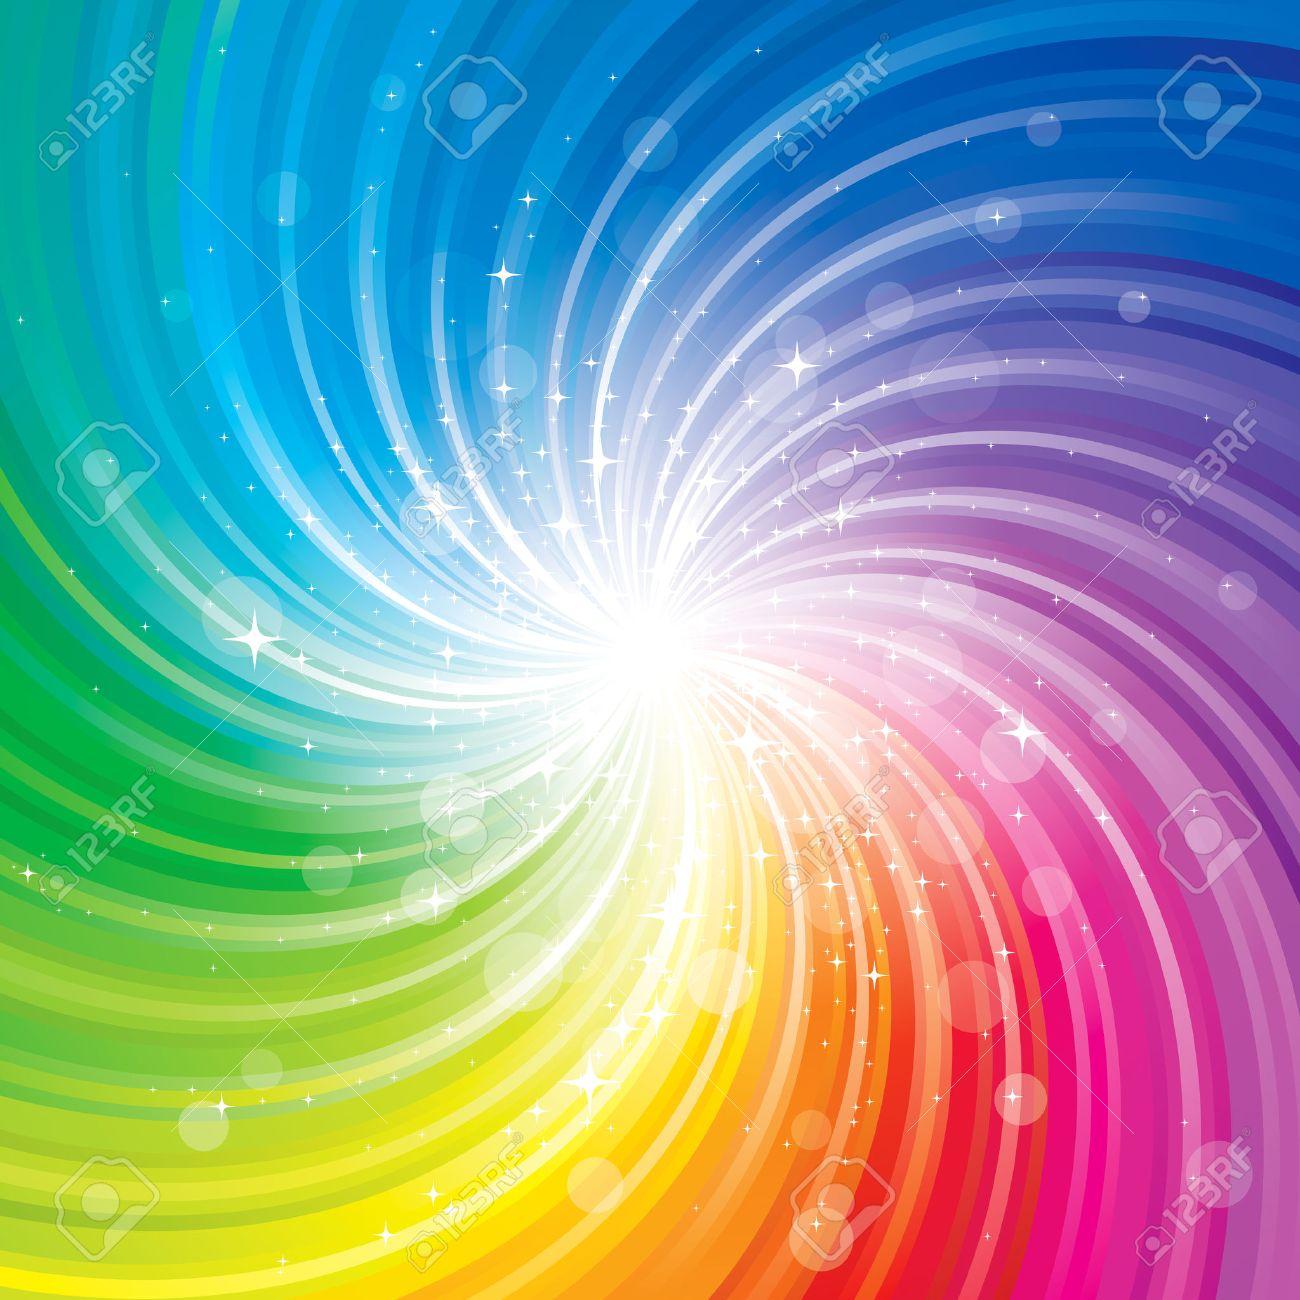 Glittering stars on colorful swirl background. - 50985044